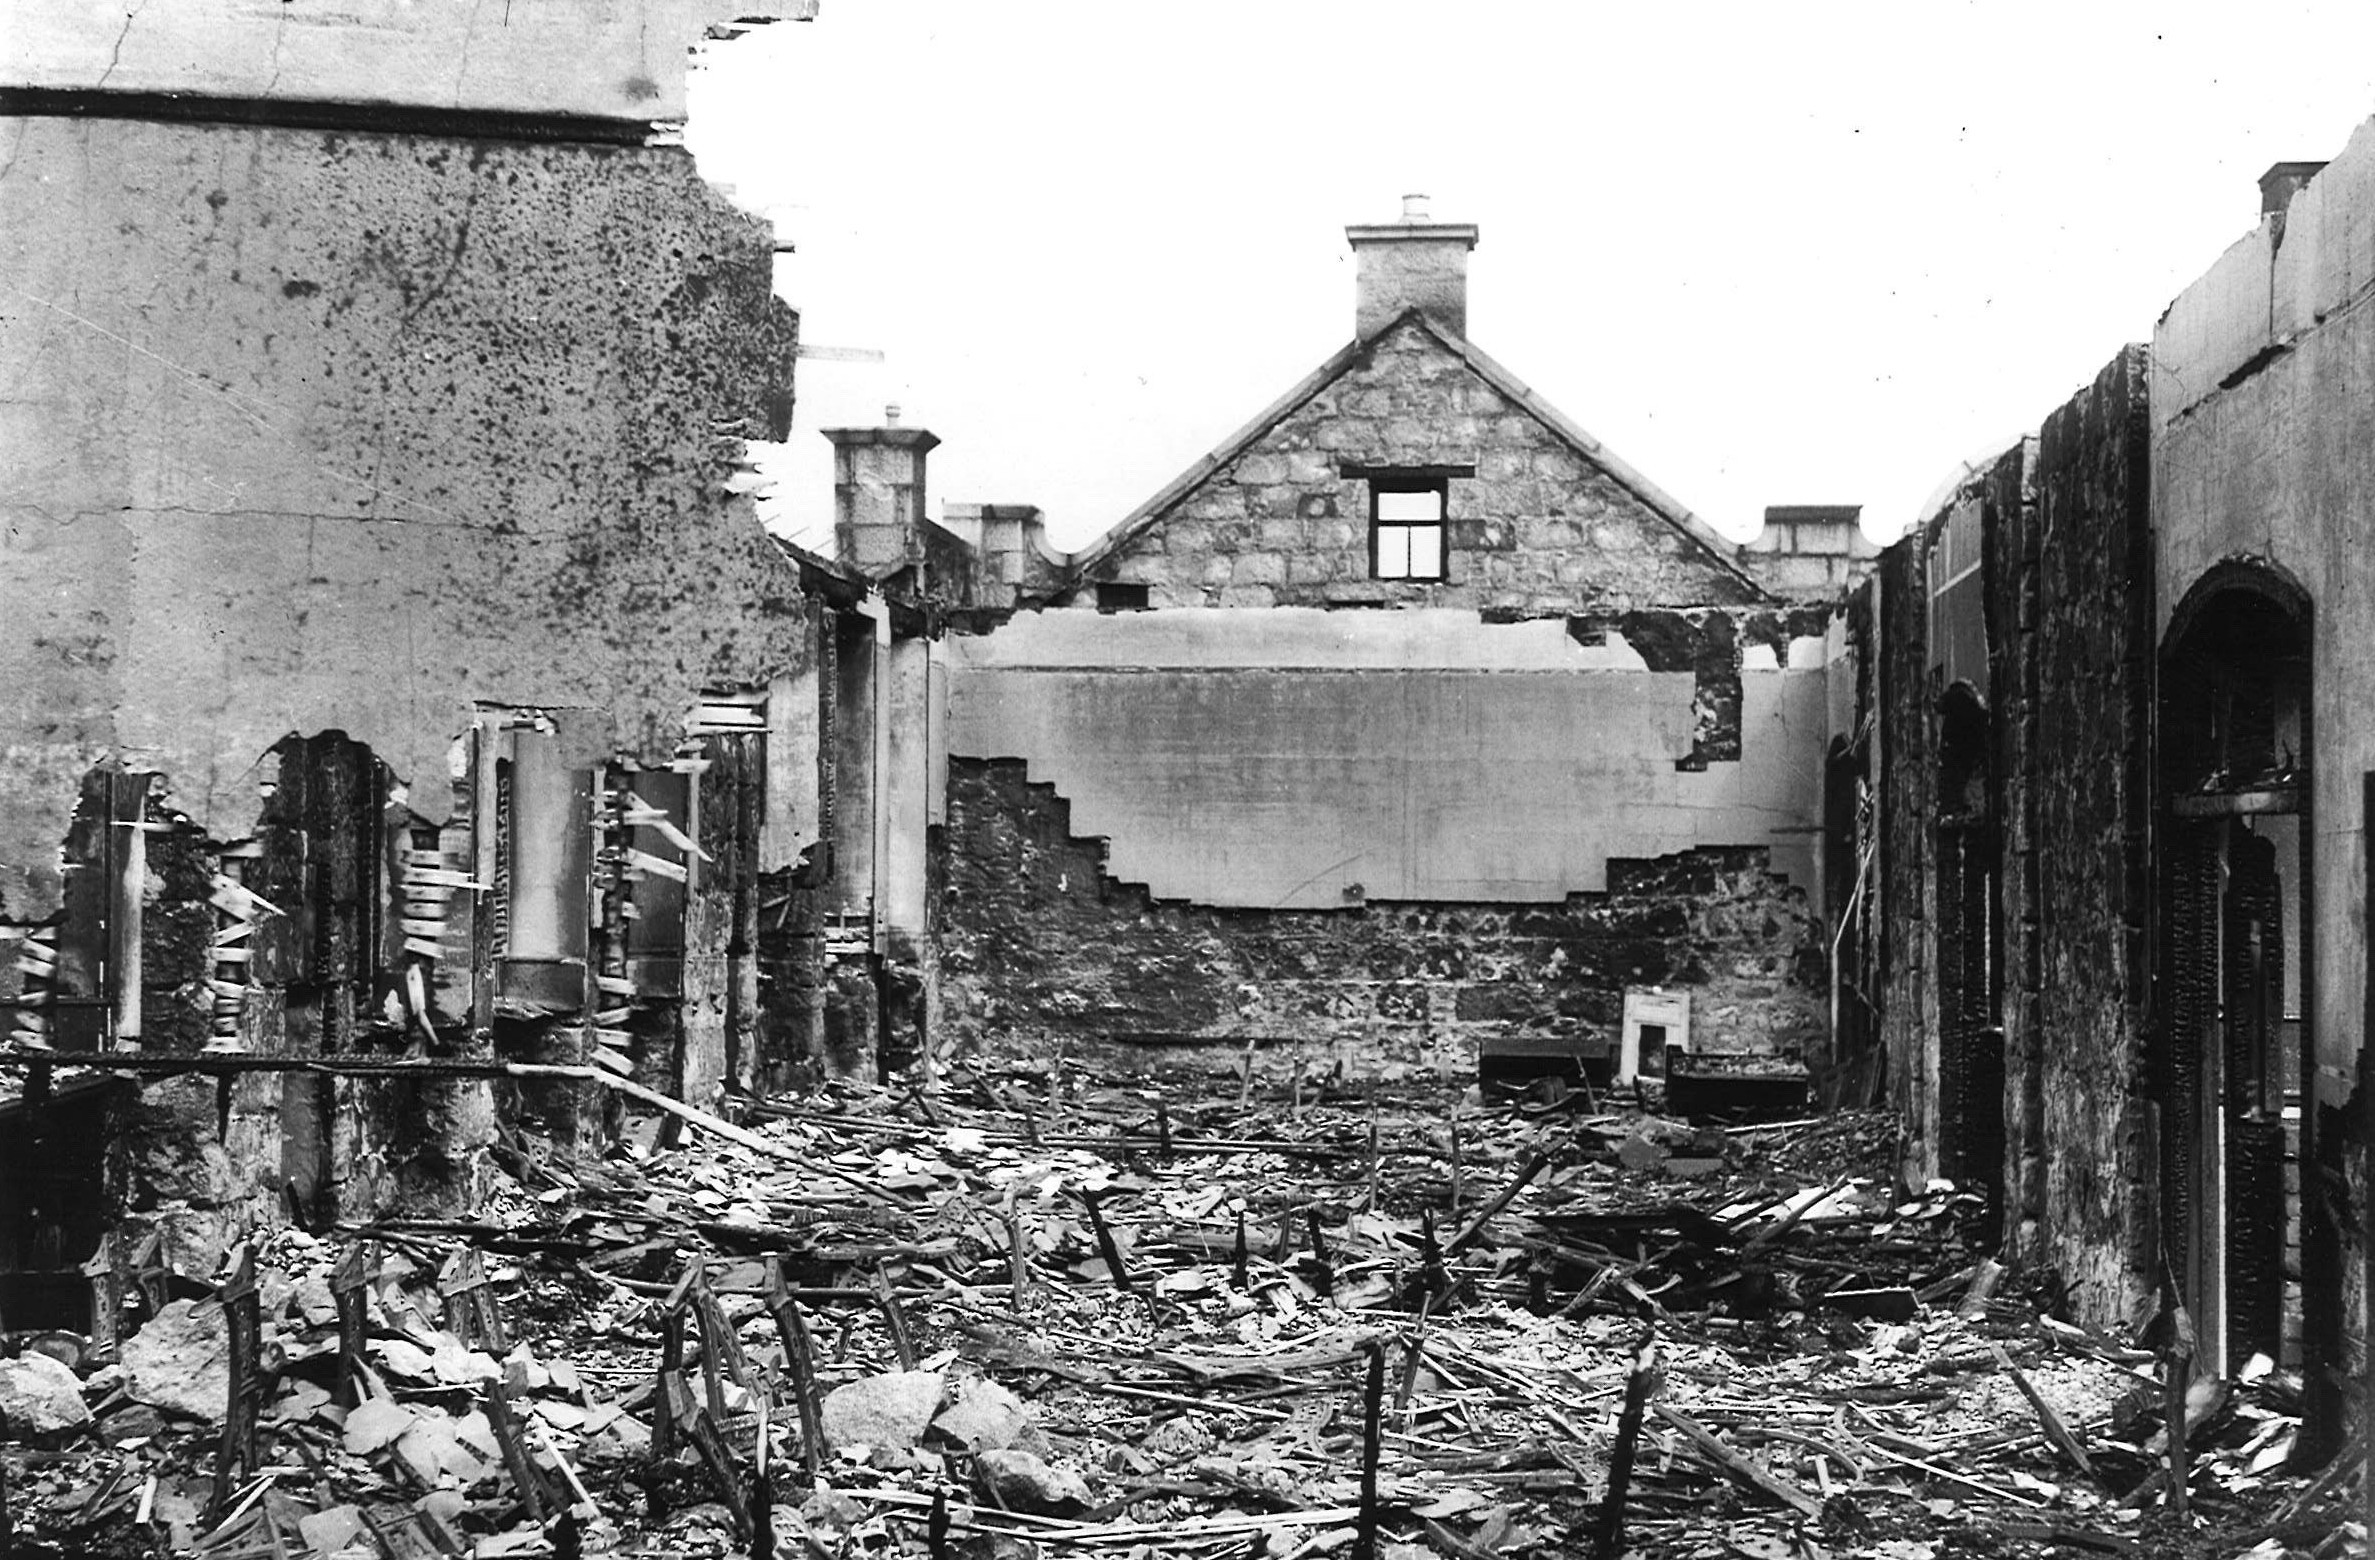 Victoria Road School after an air raid, July 1940